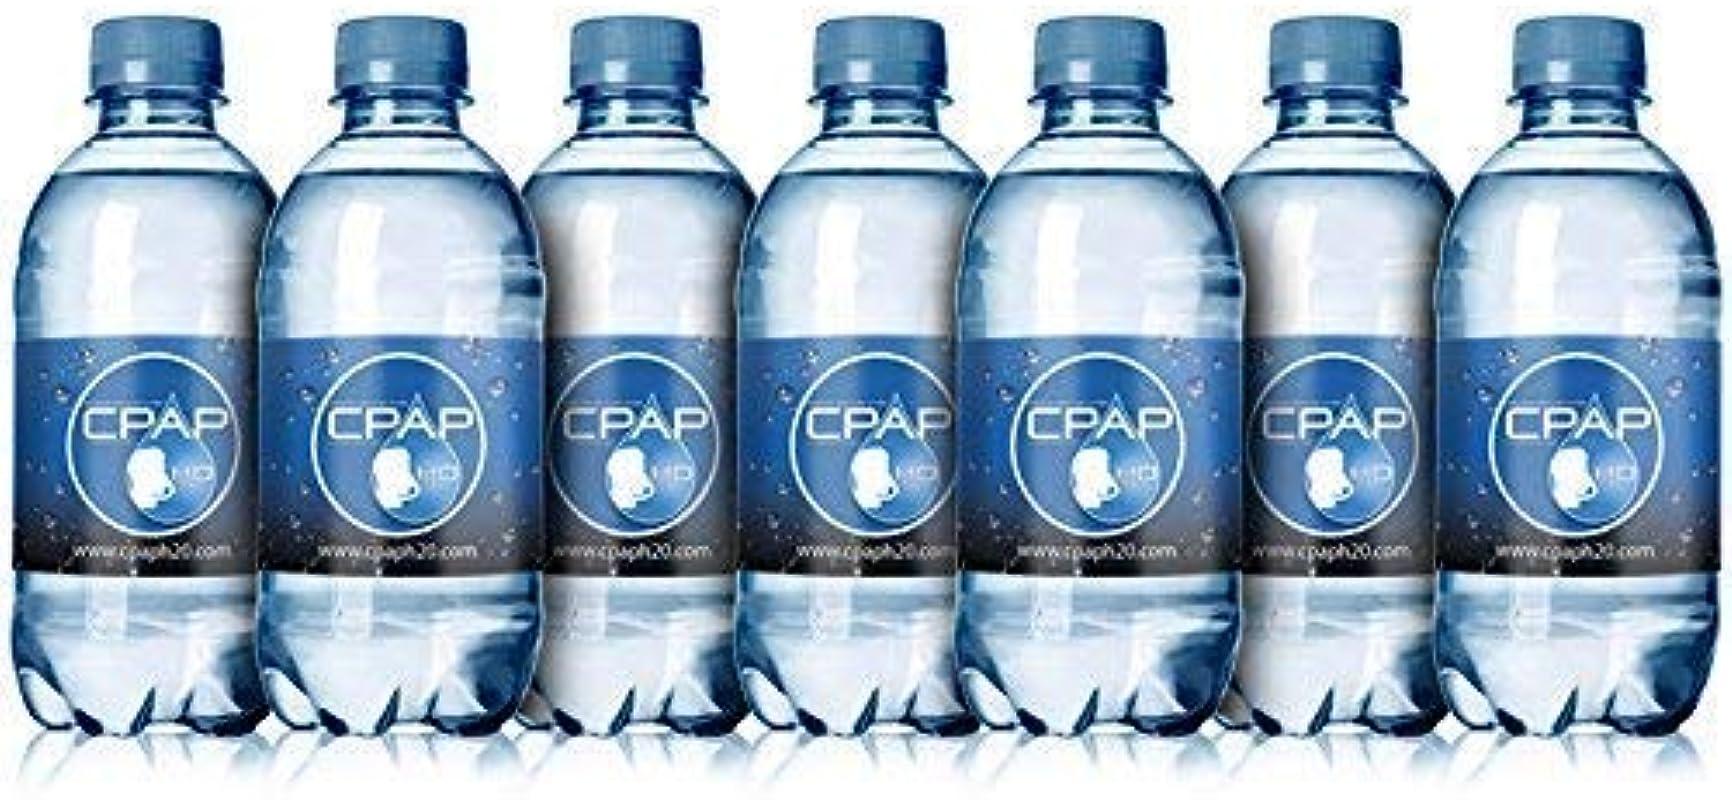 CPAP H2O Premium Distilled Water 24 Bottle Pack